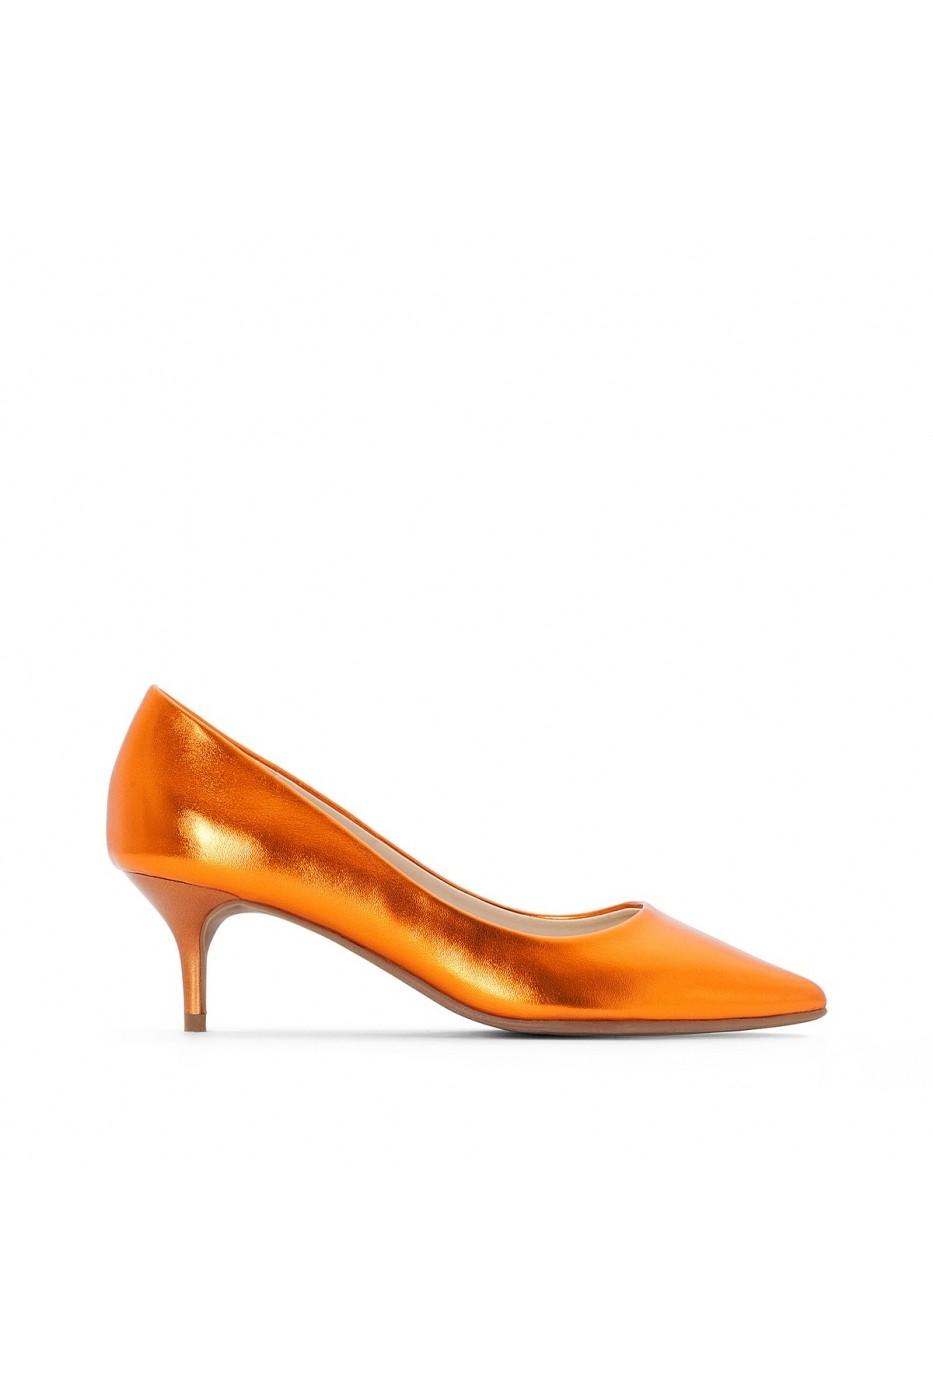 52c438417b MADEMOISELLE R Magassarkú cipő LRD-GEI516-orange narancs - FashionUP!